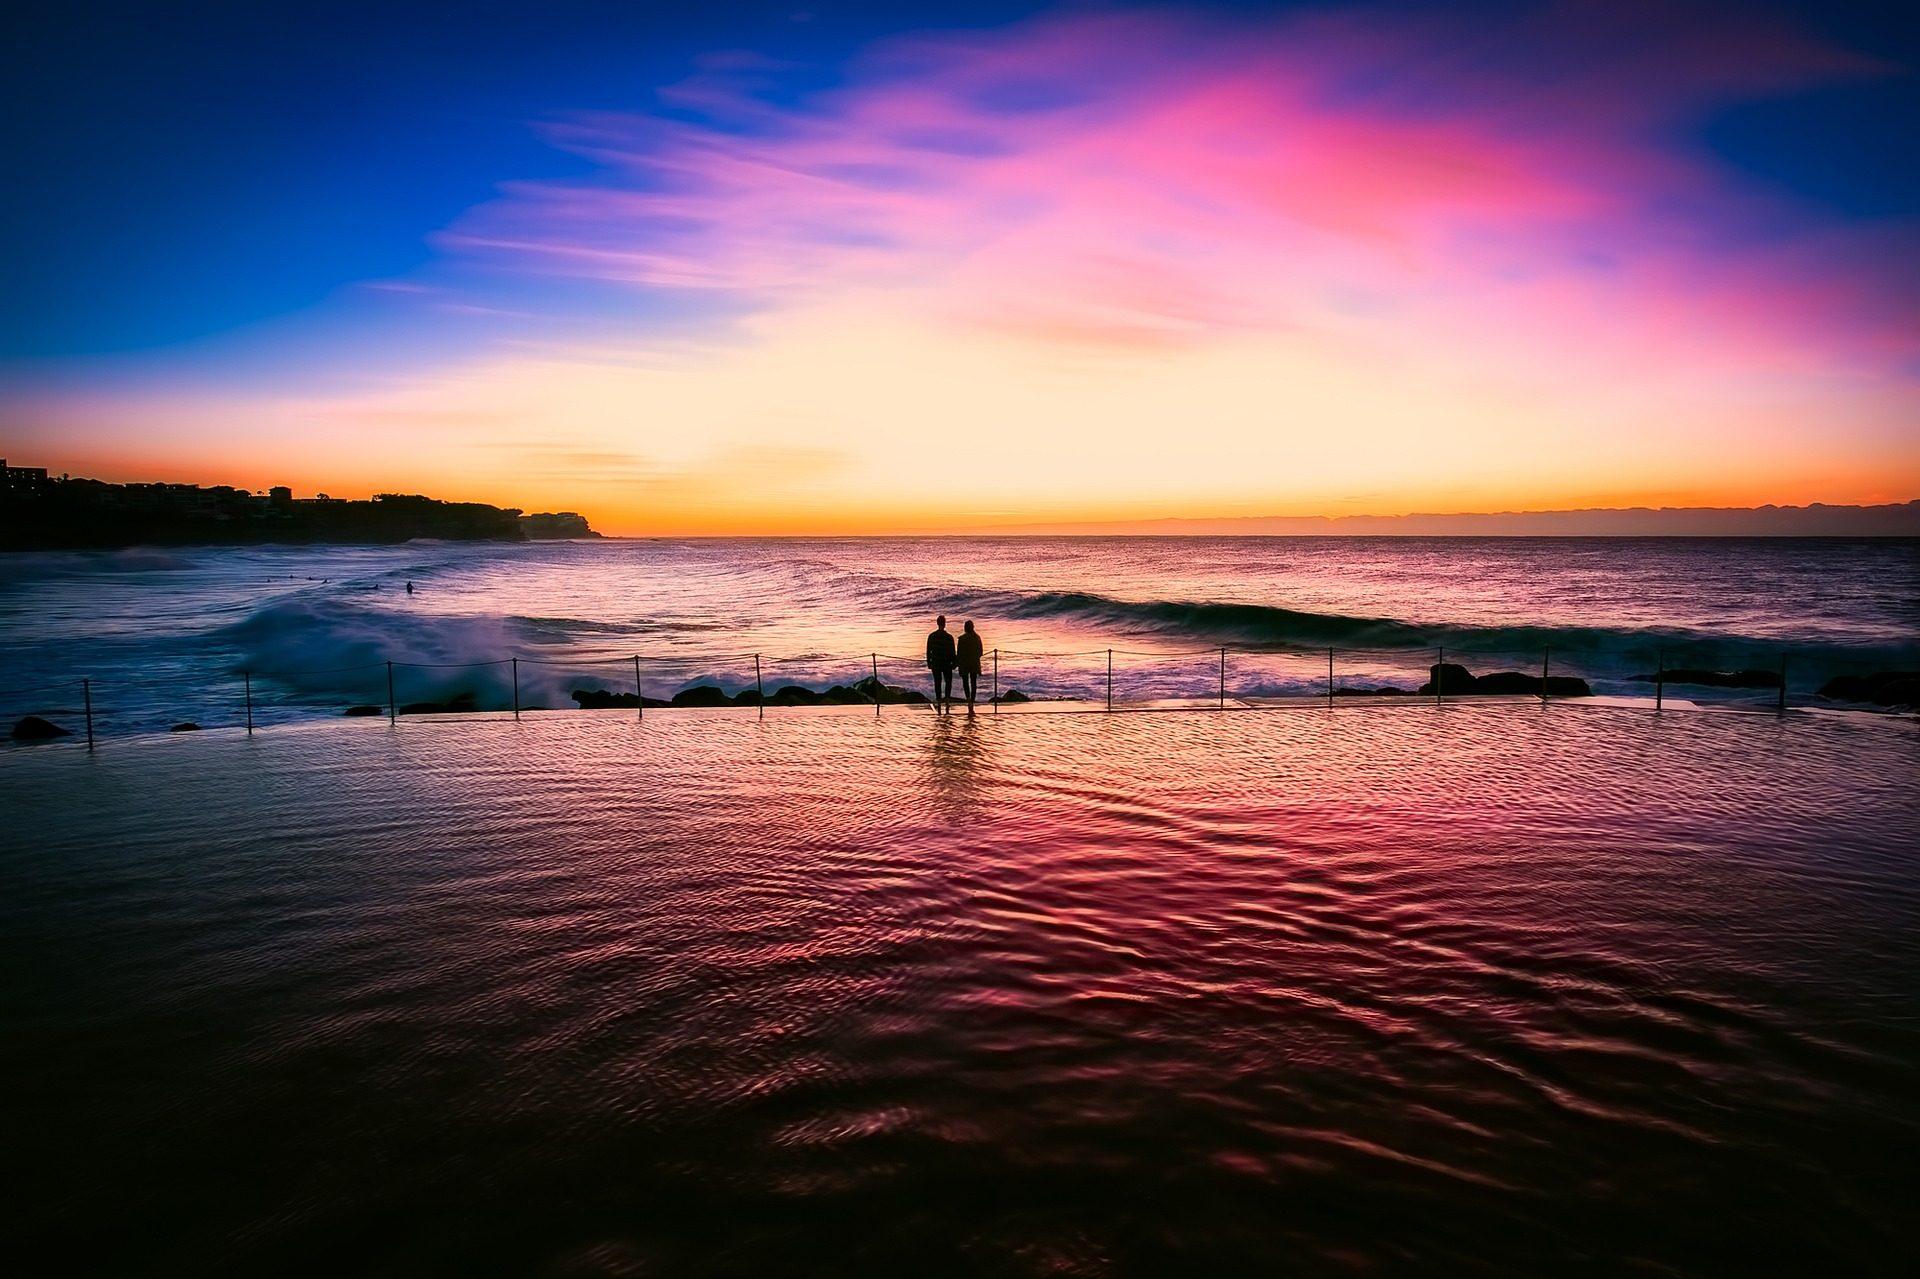 Mare, Ocean, Tramonto, coppia, Sagoma - Sfondi HD - Professor-falken.com